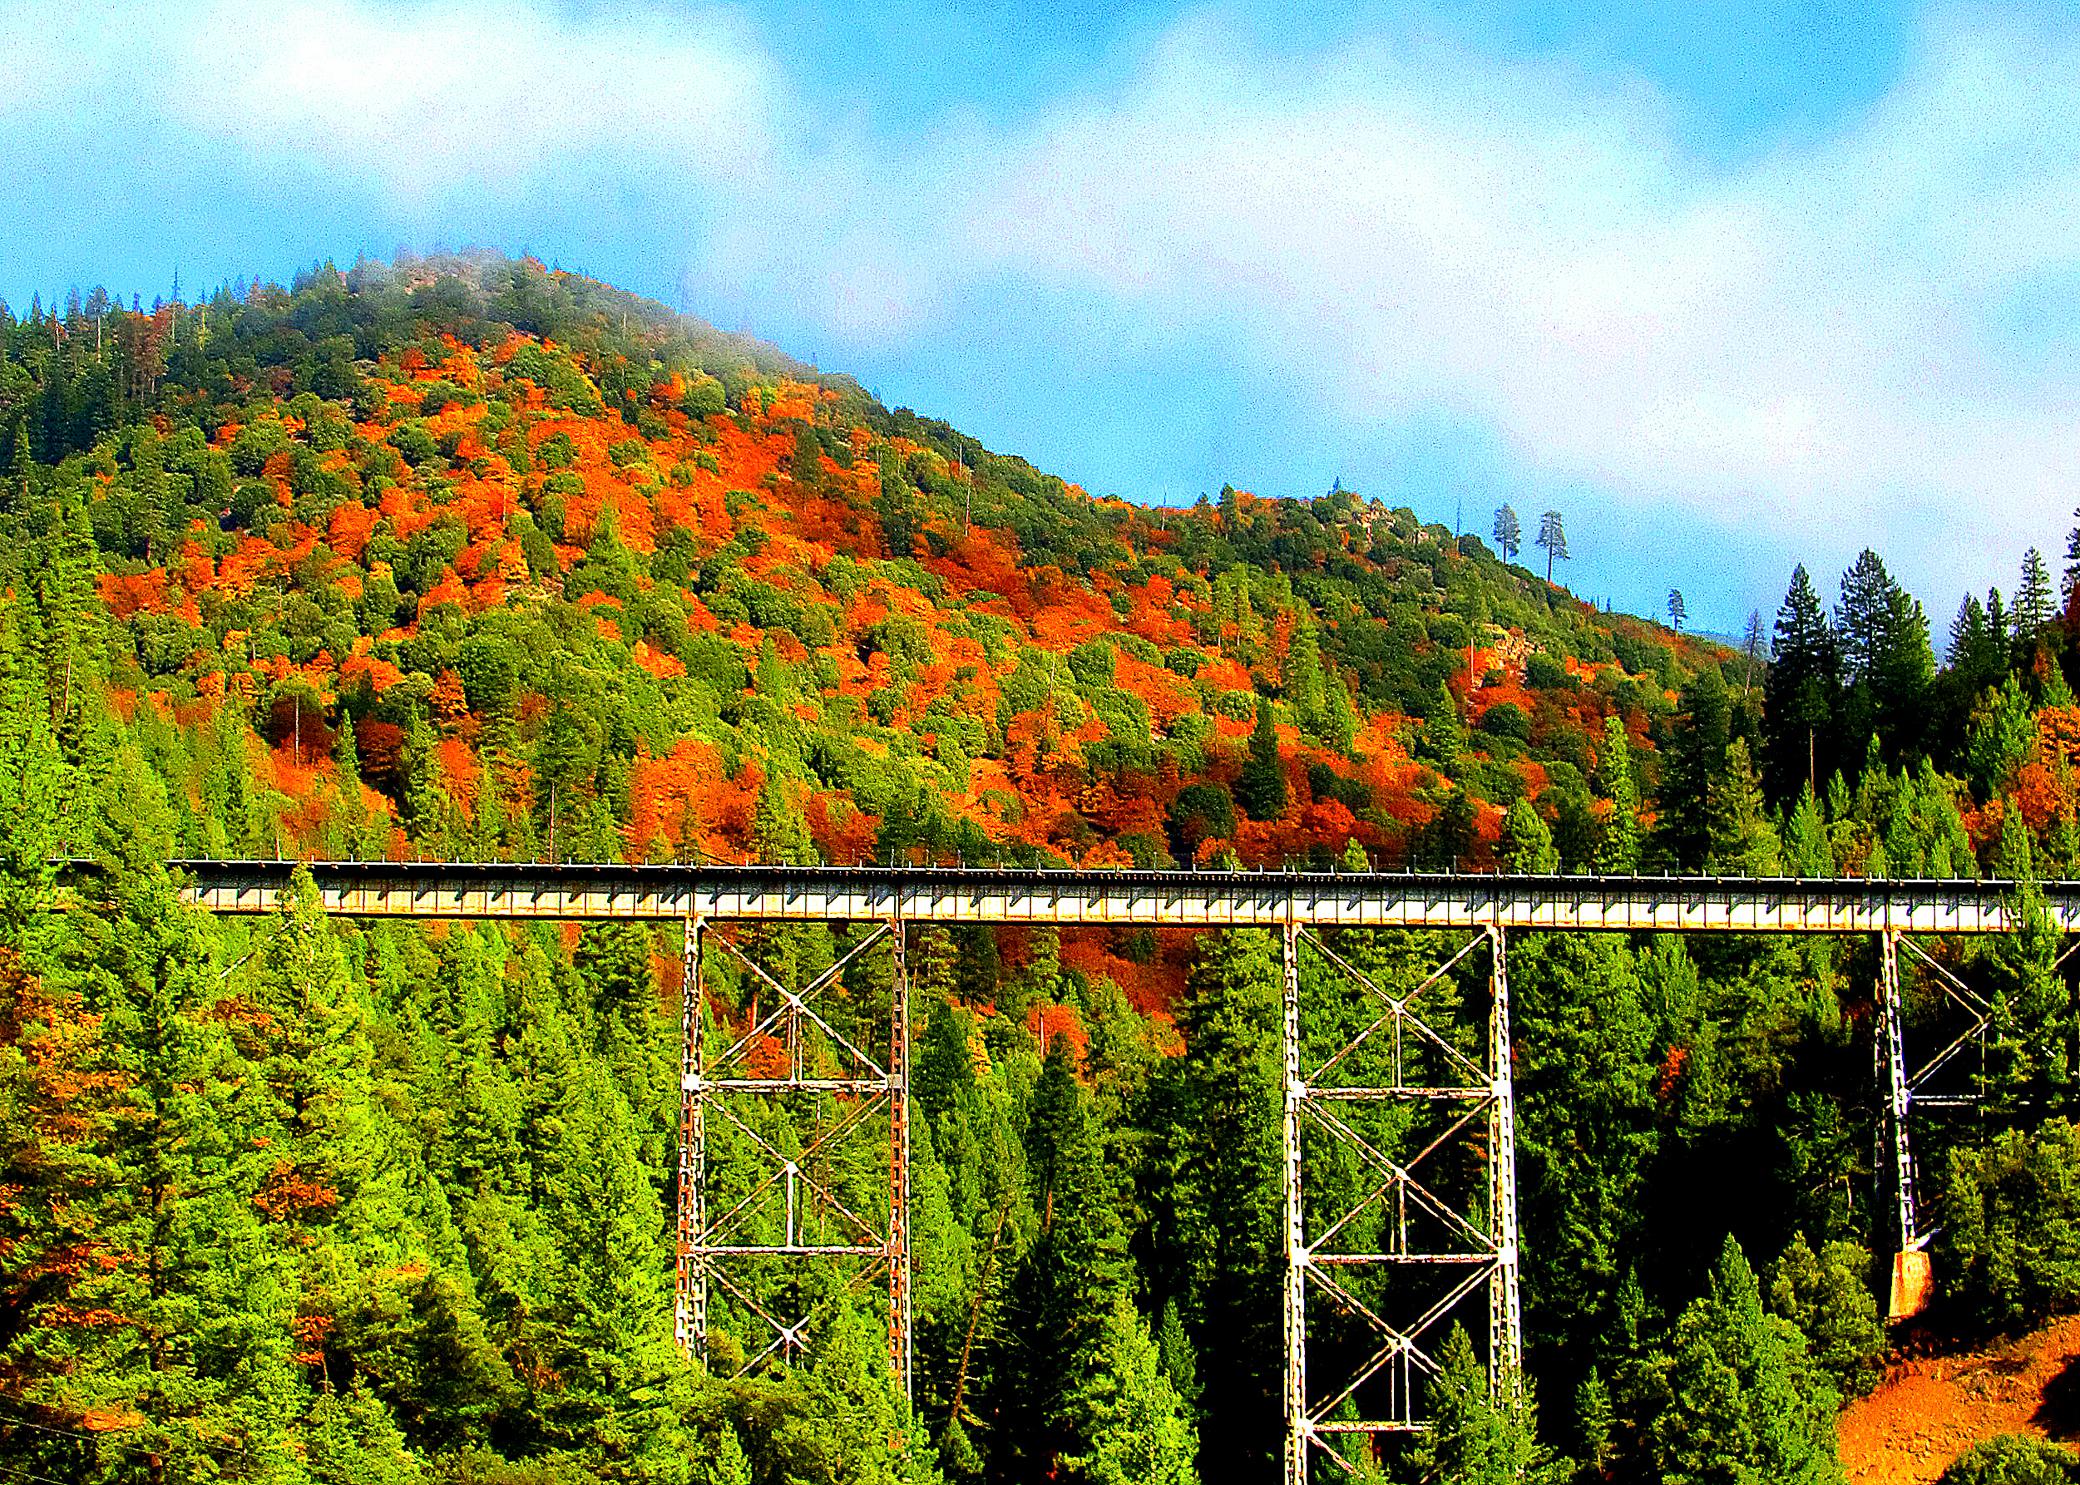 Train Spotting Meets Color Spotting – California Fall Color